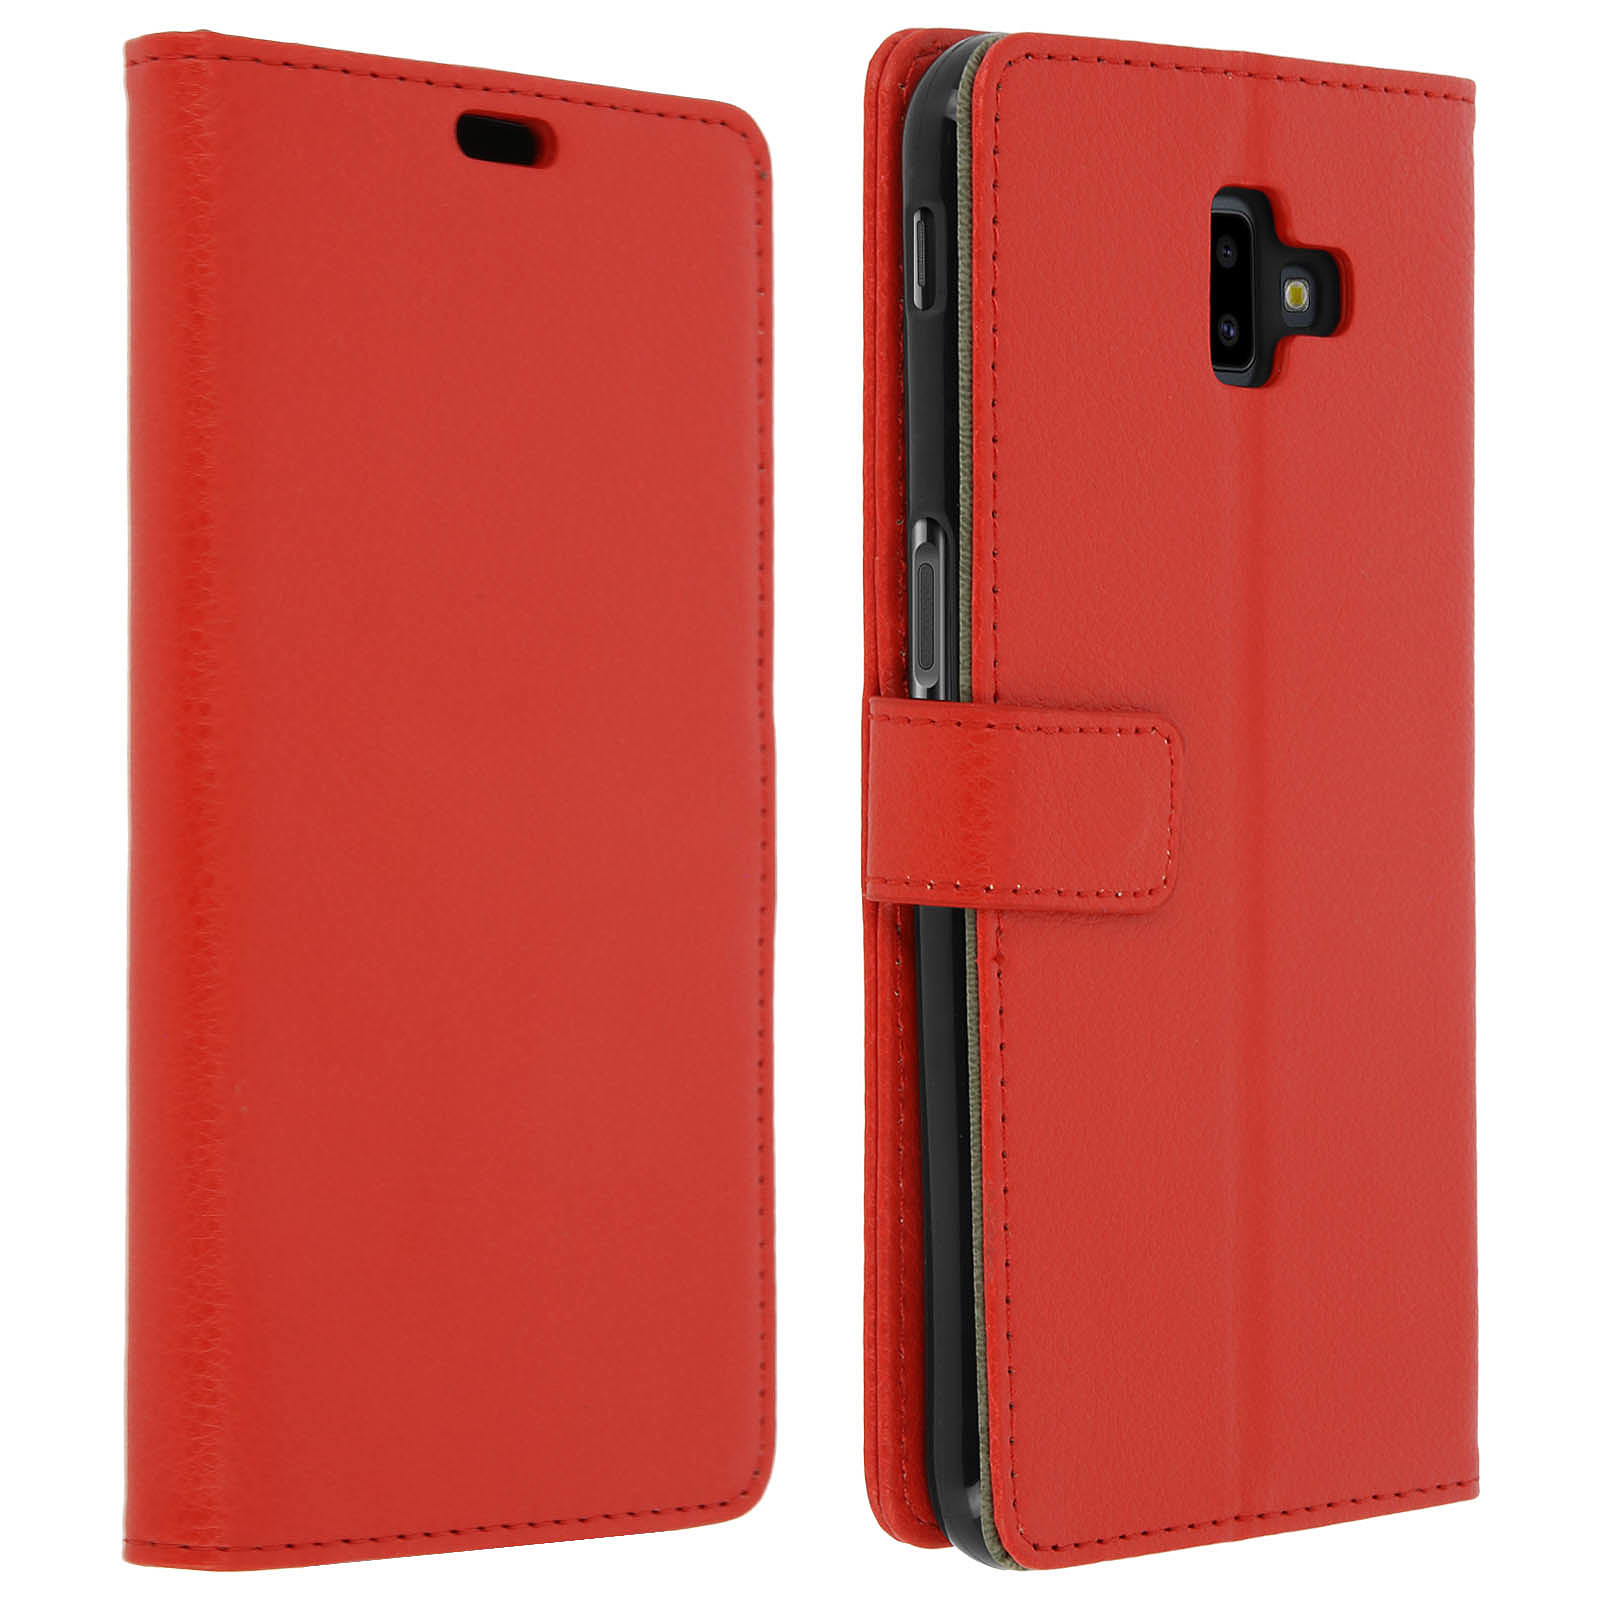 Avizar Etui folio Rouge Portefeuille pour Samsung Galaxy J6 Plus